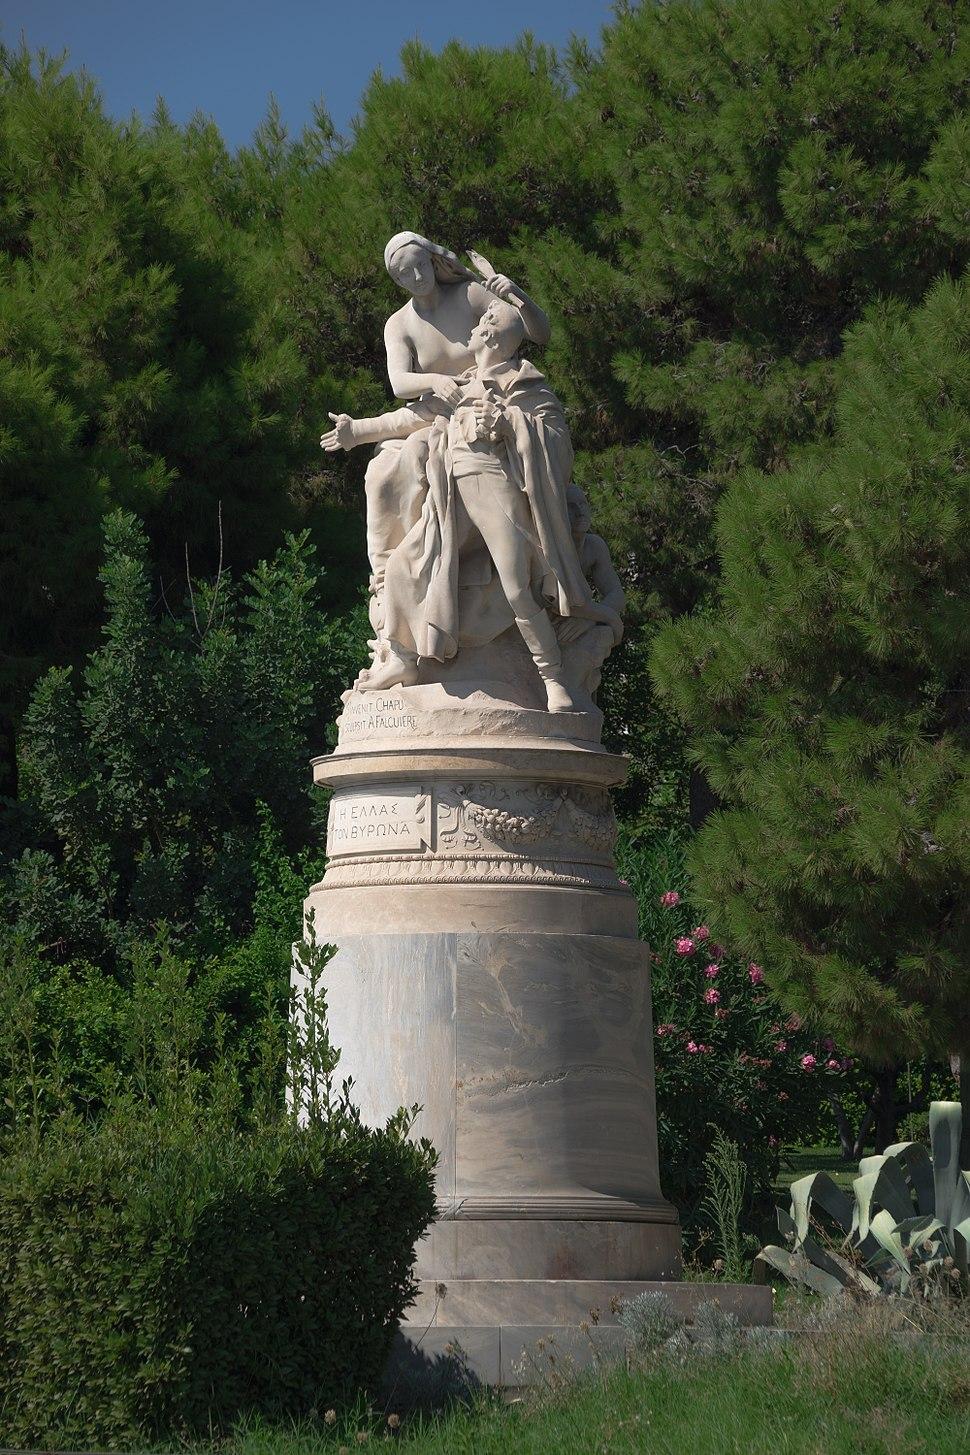 Monument to Georges Gordon Byron, Athens, Greece